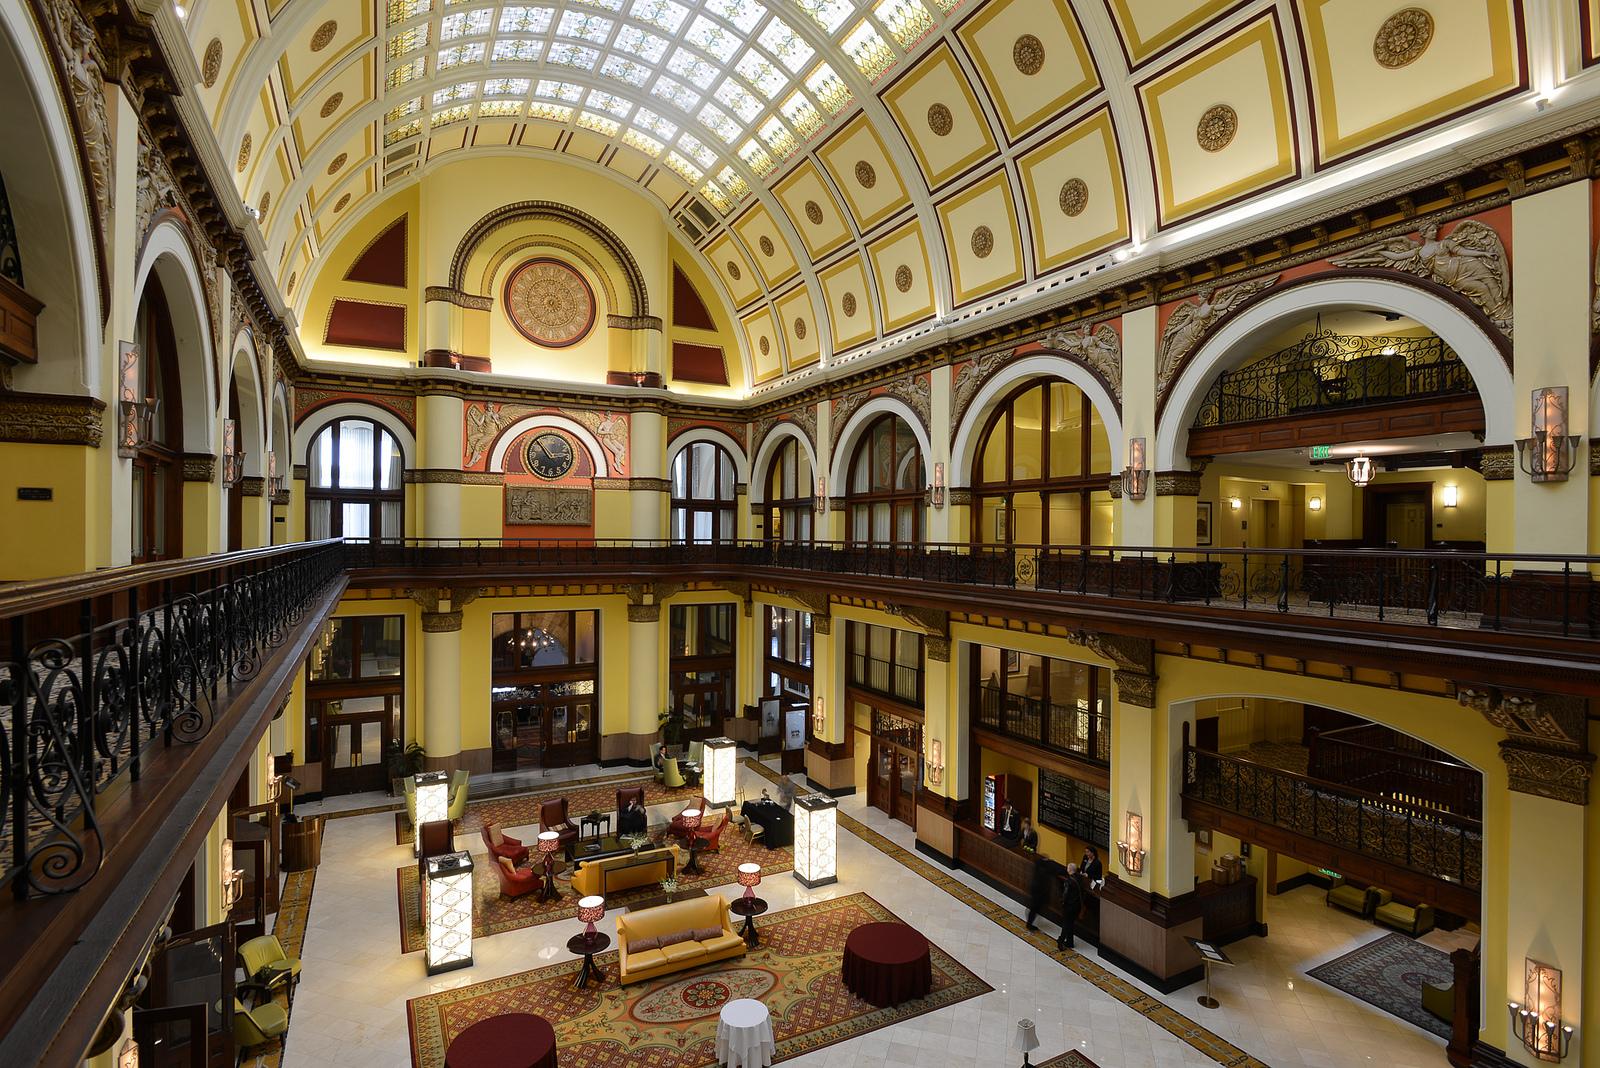 Uniton Station Hotel in Nashville, TN.